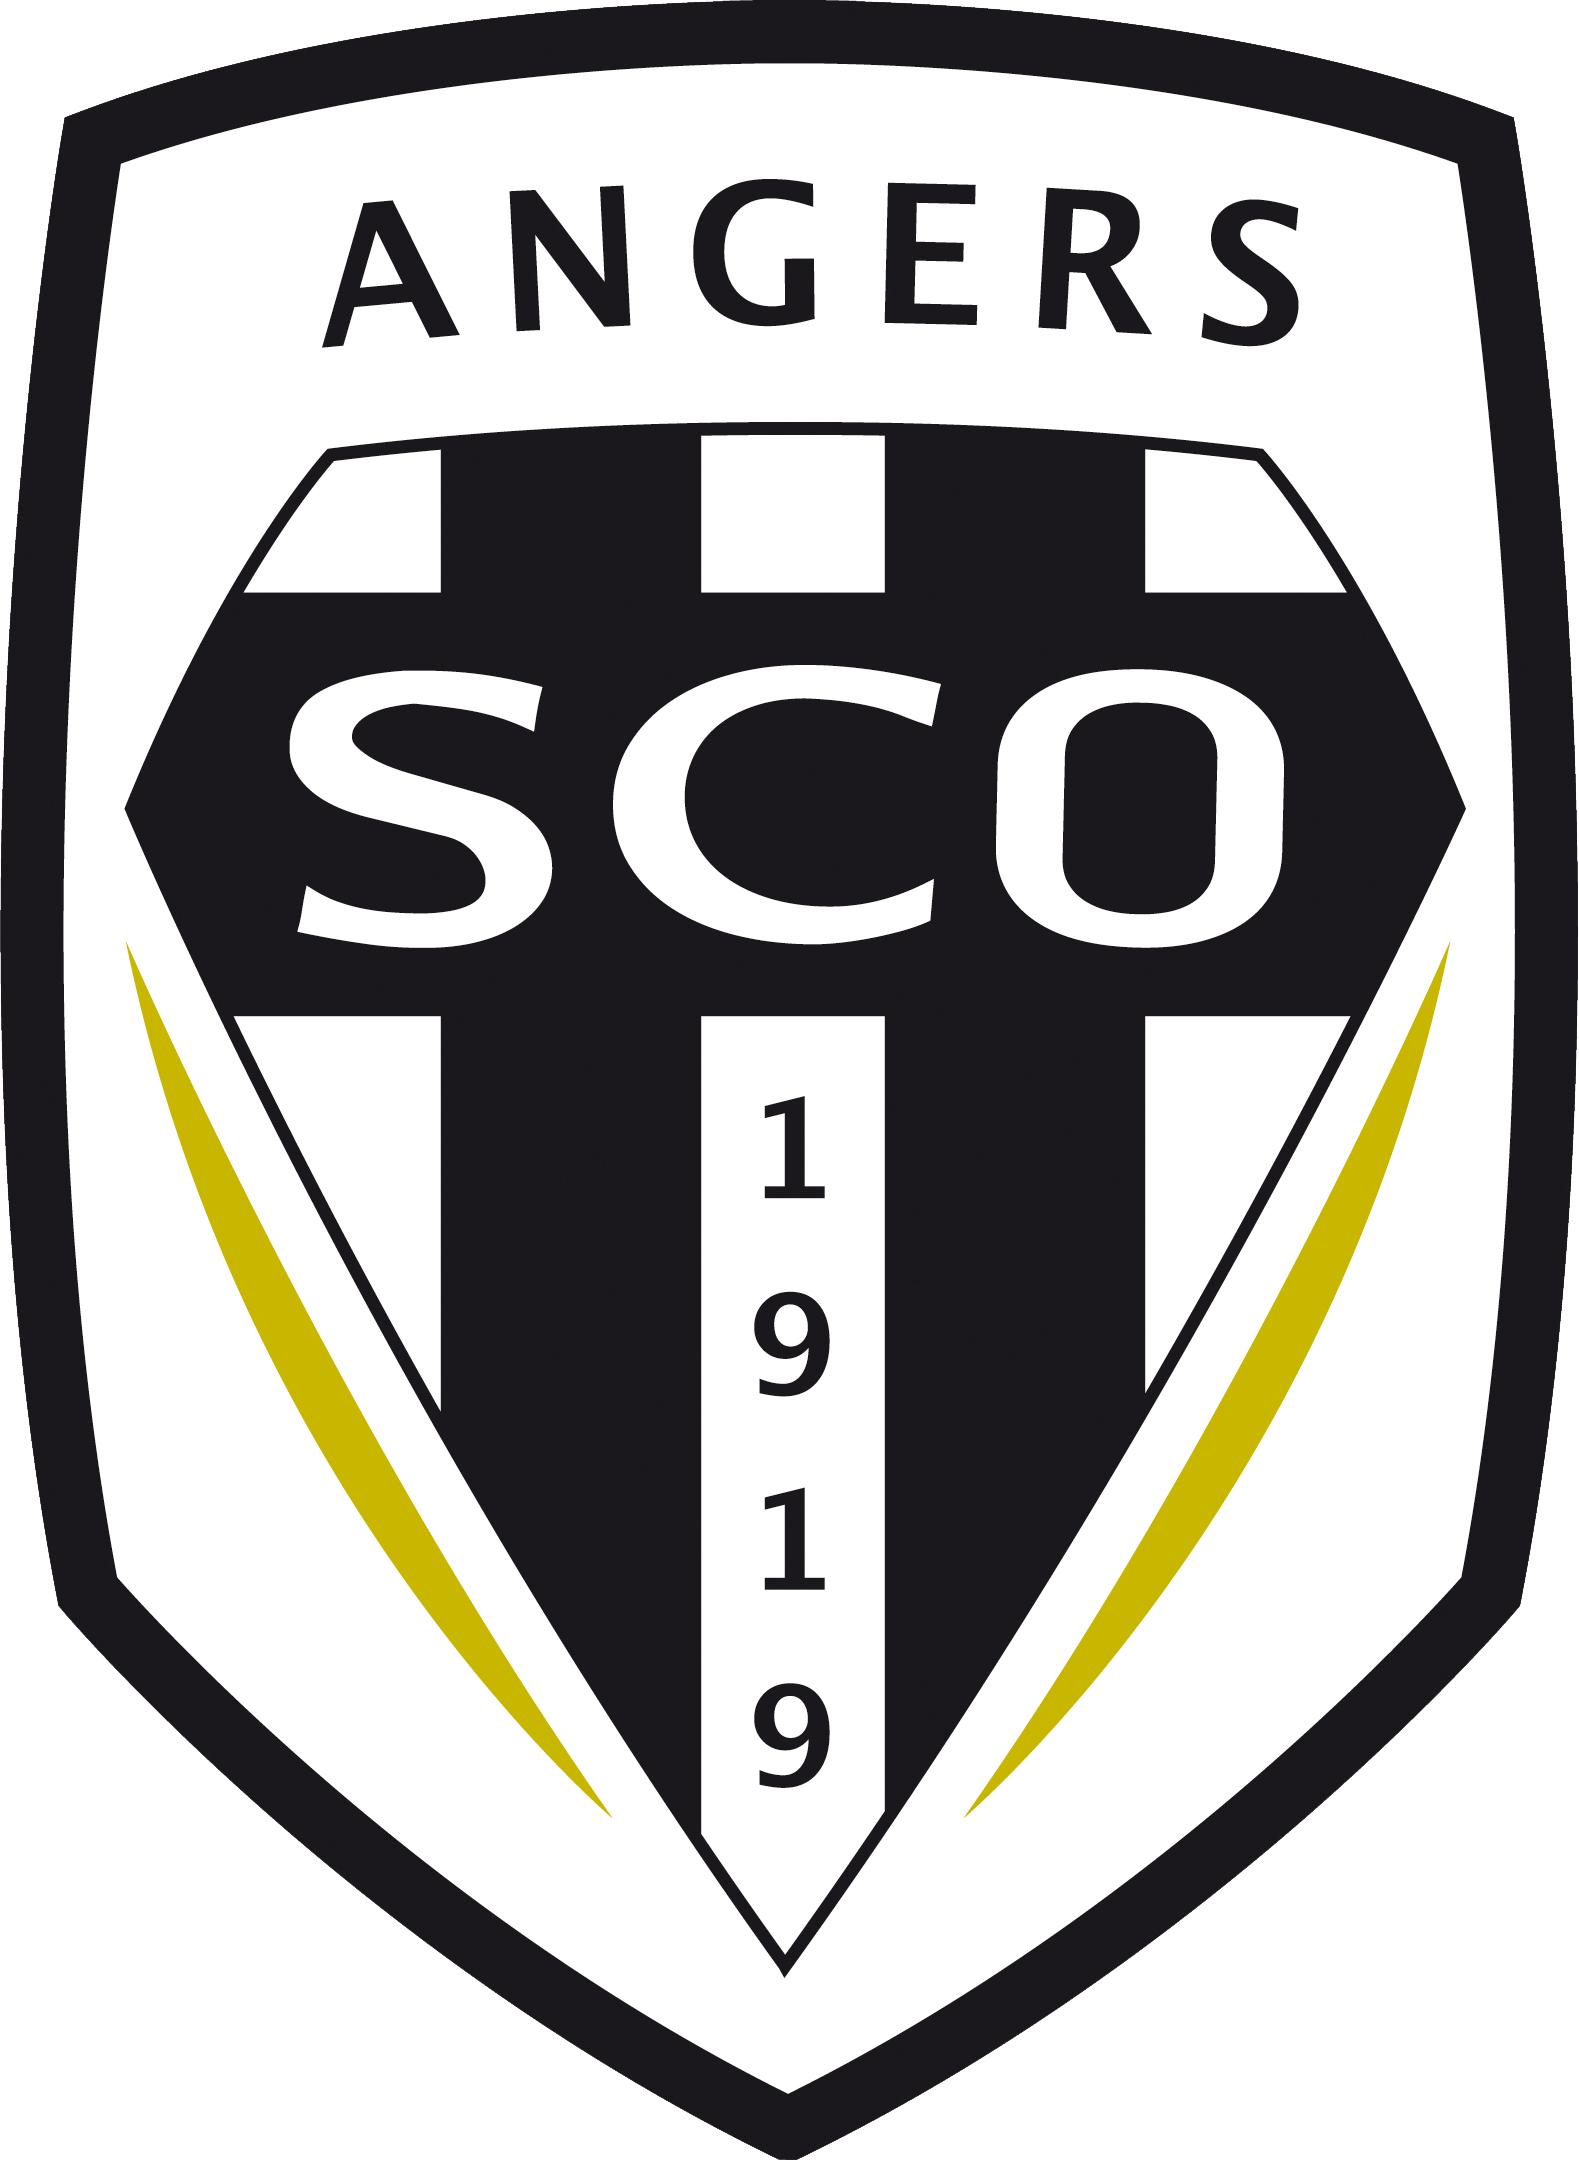 Coloriage Foot Sco Angers.Coloriage Football Angers A Imprimer Et Colorier